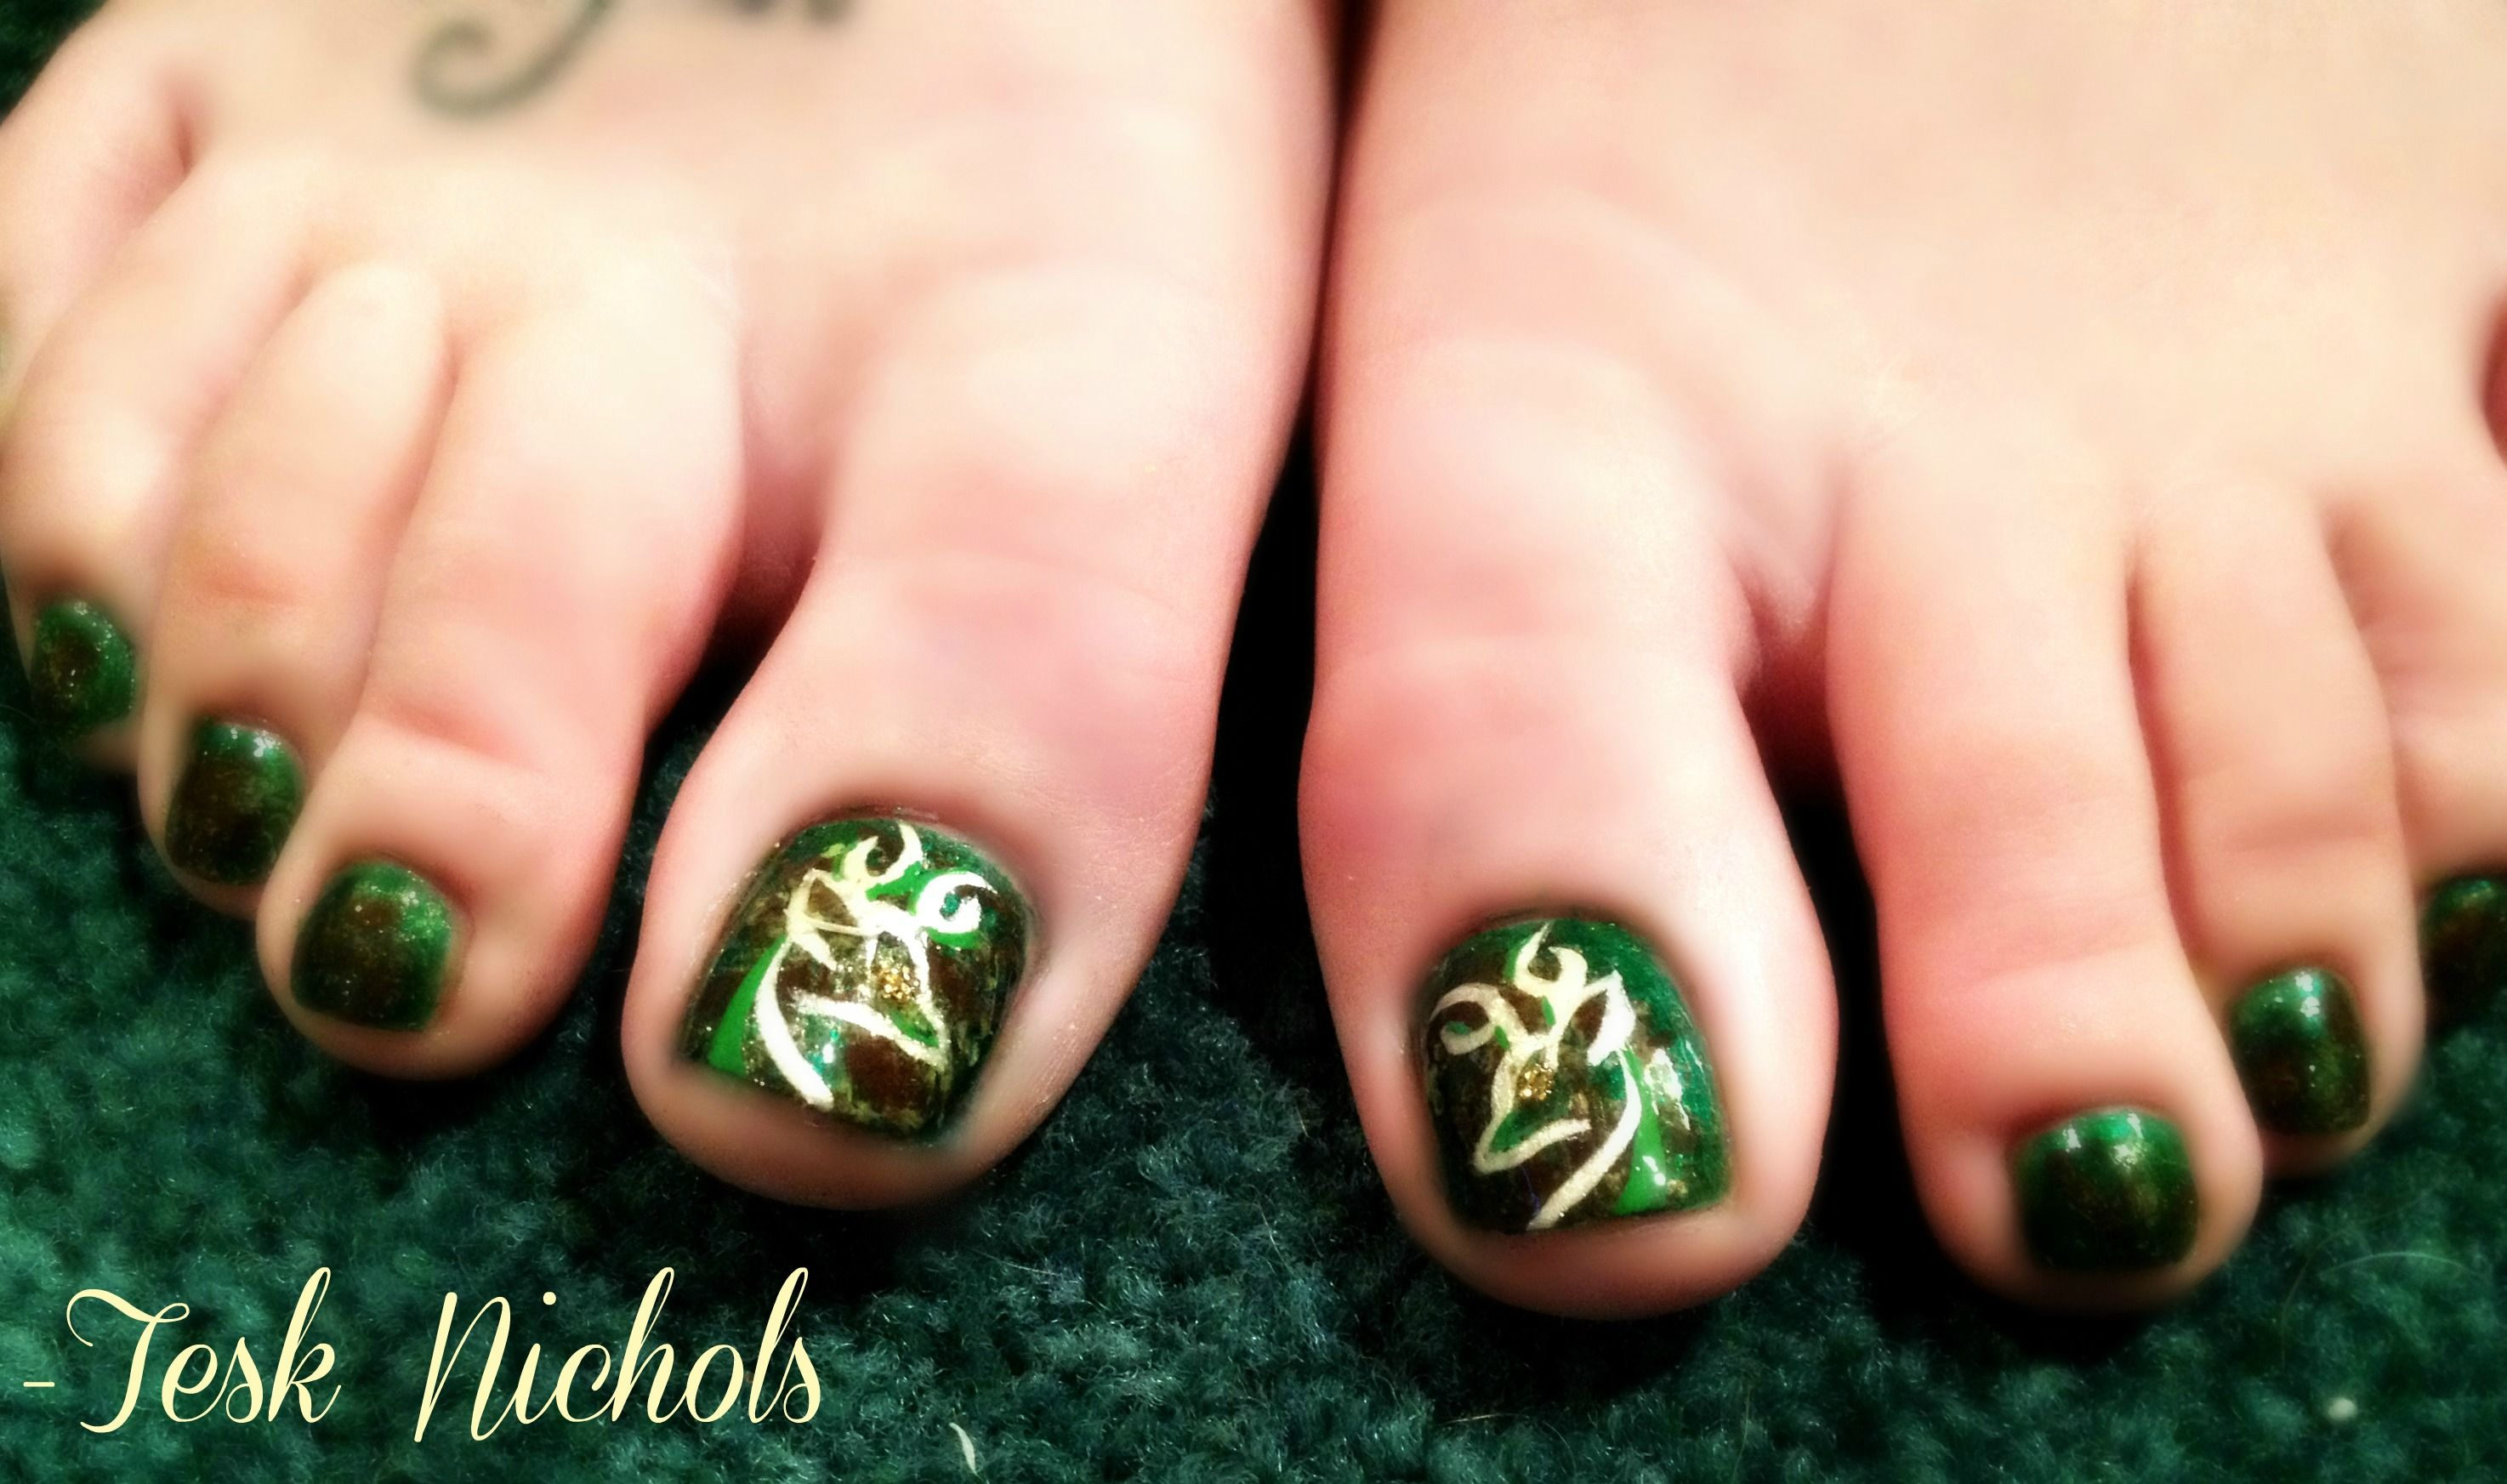 camo toenails with browning branding